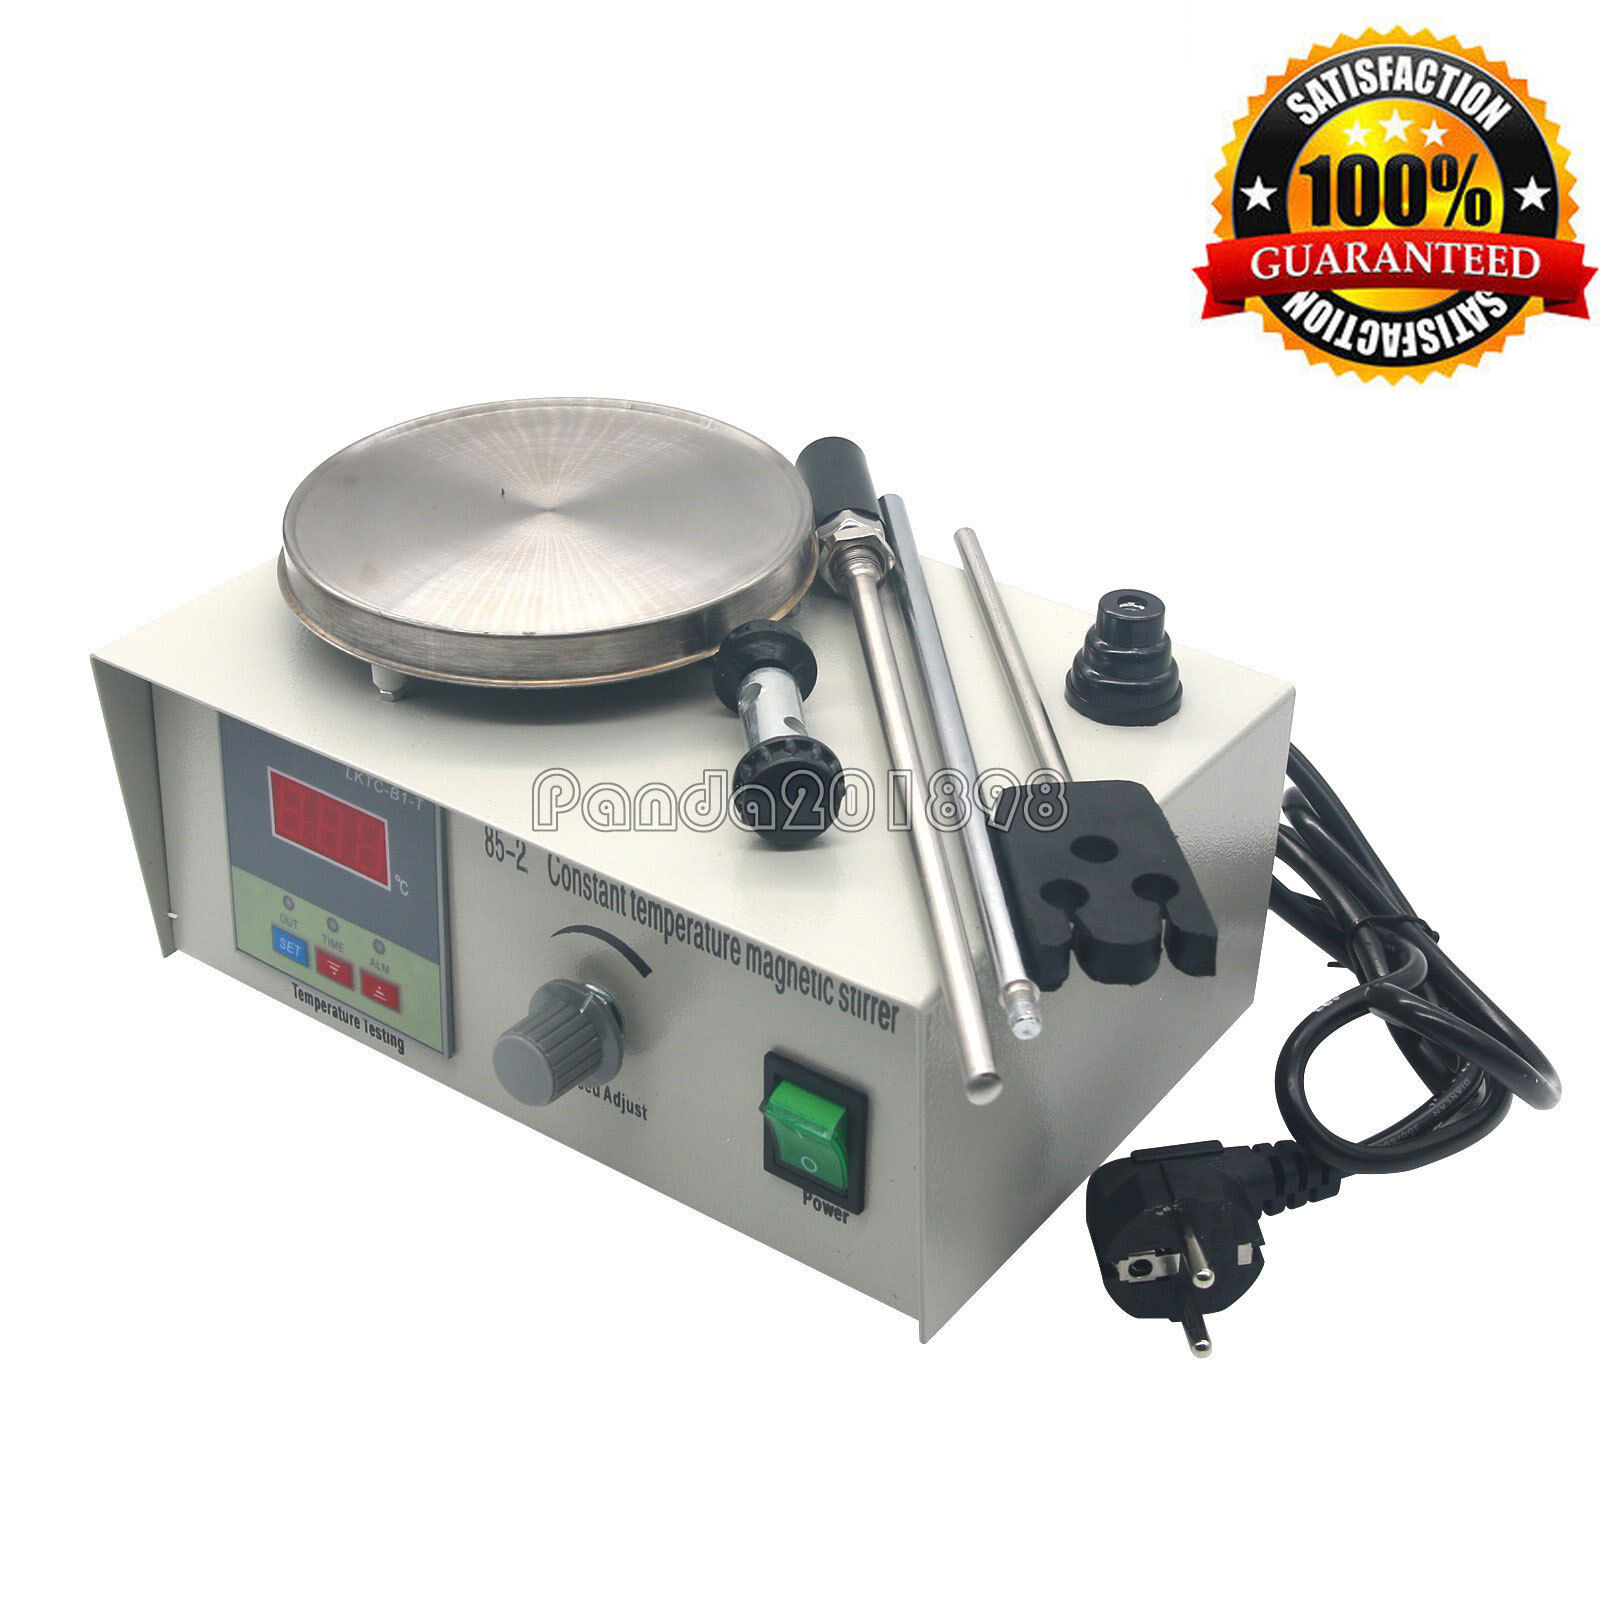 Magnetrührer Heizung Heizplatte 85-2 Magnetische Mixer Stirrer 220V paEU DE fas